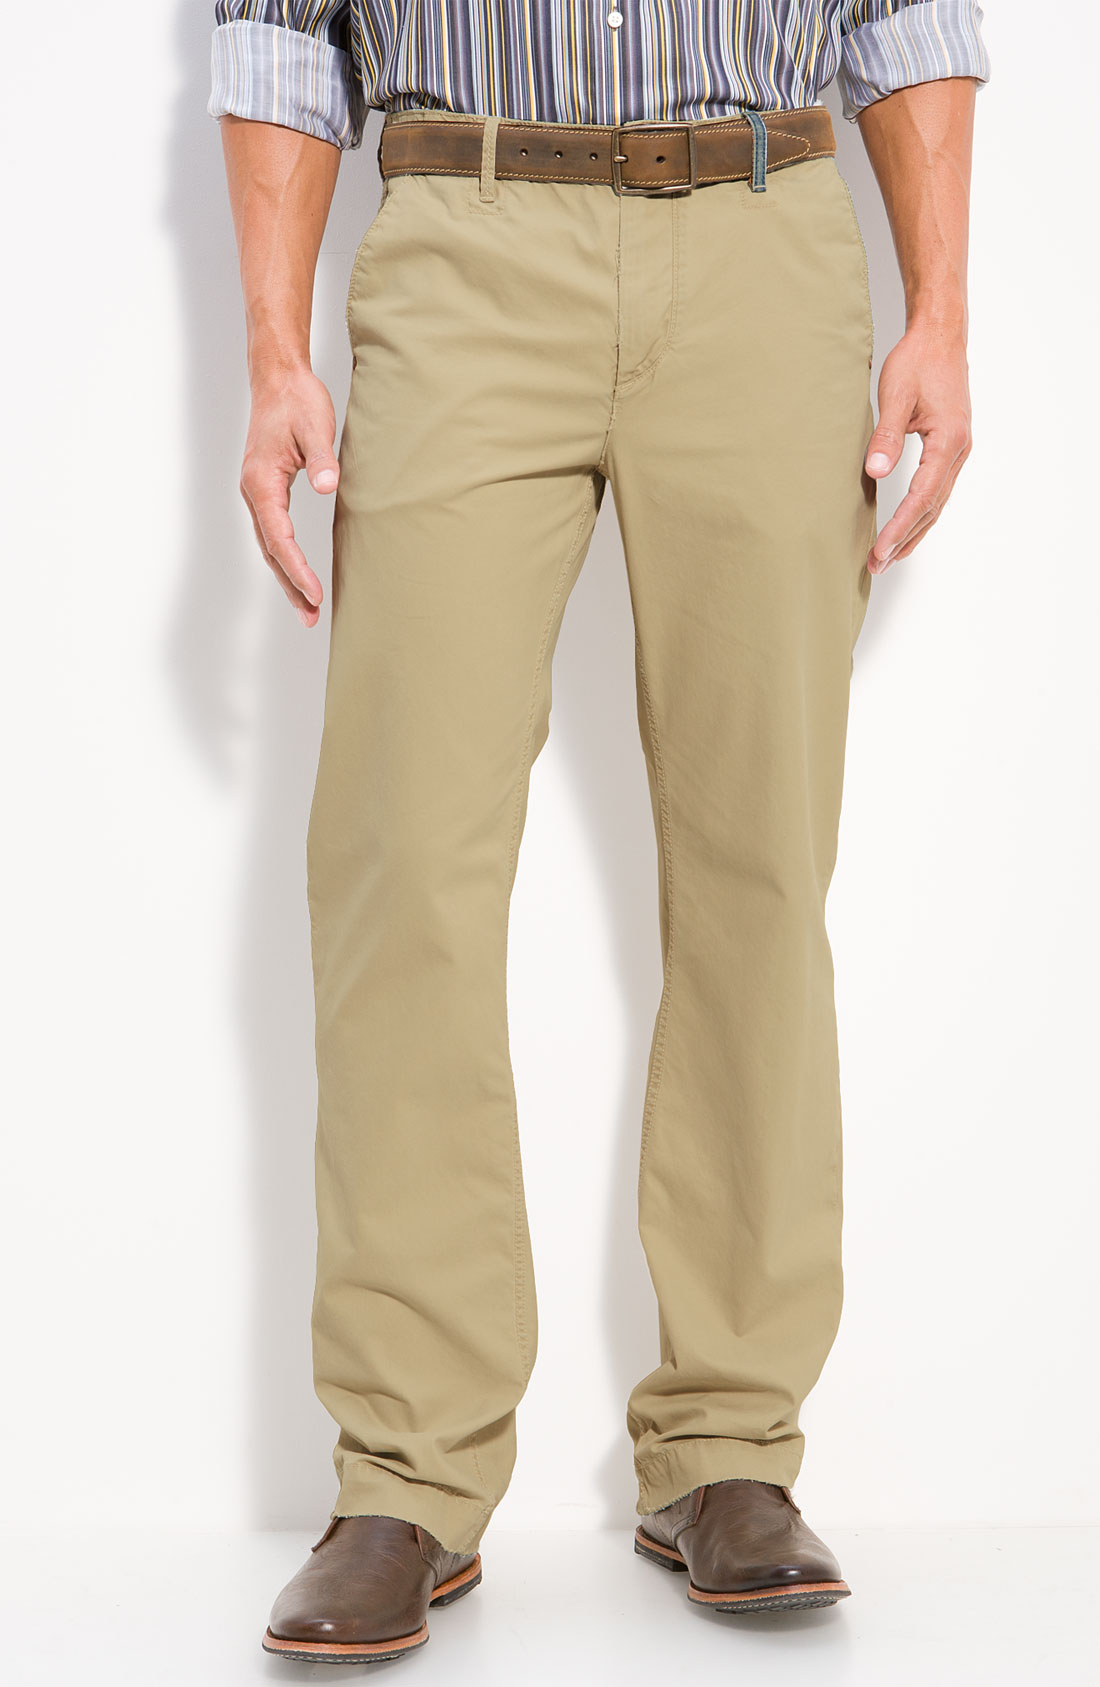 Robert Graham Jeans Yates Classic Fit Pants in Khaki for ...